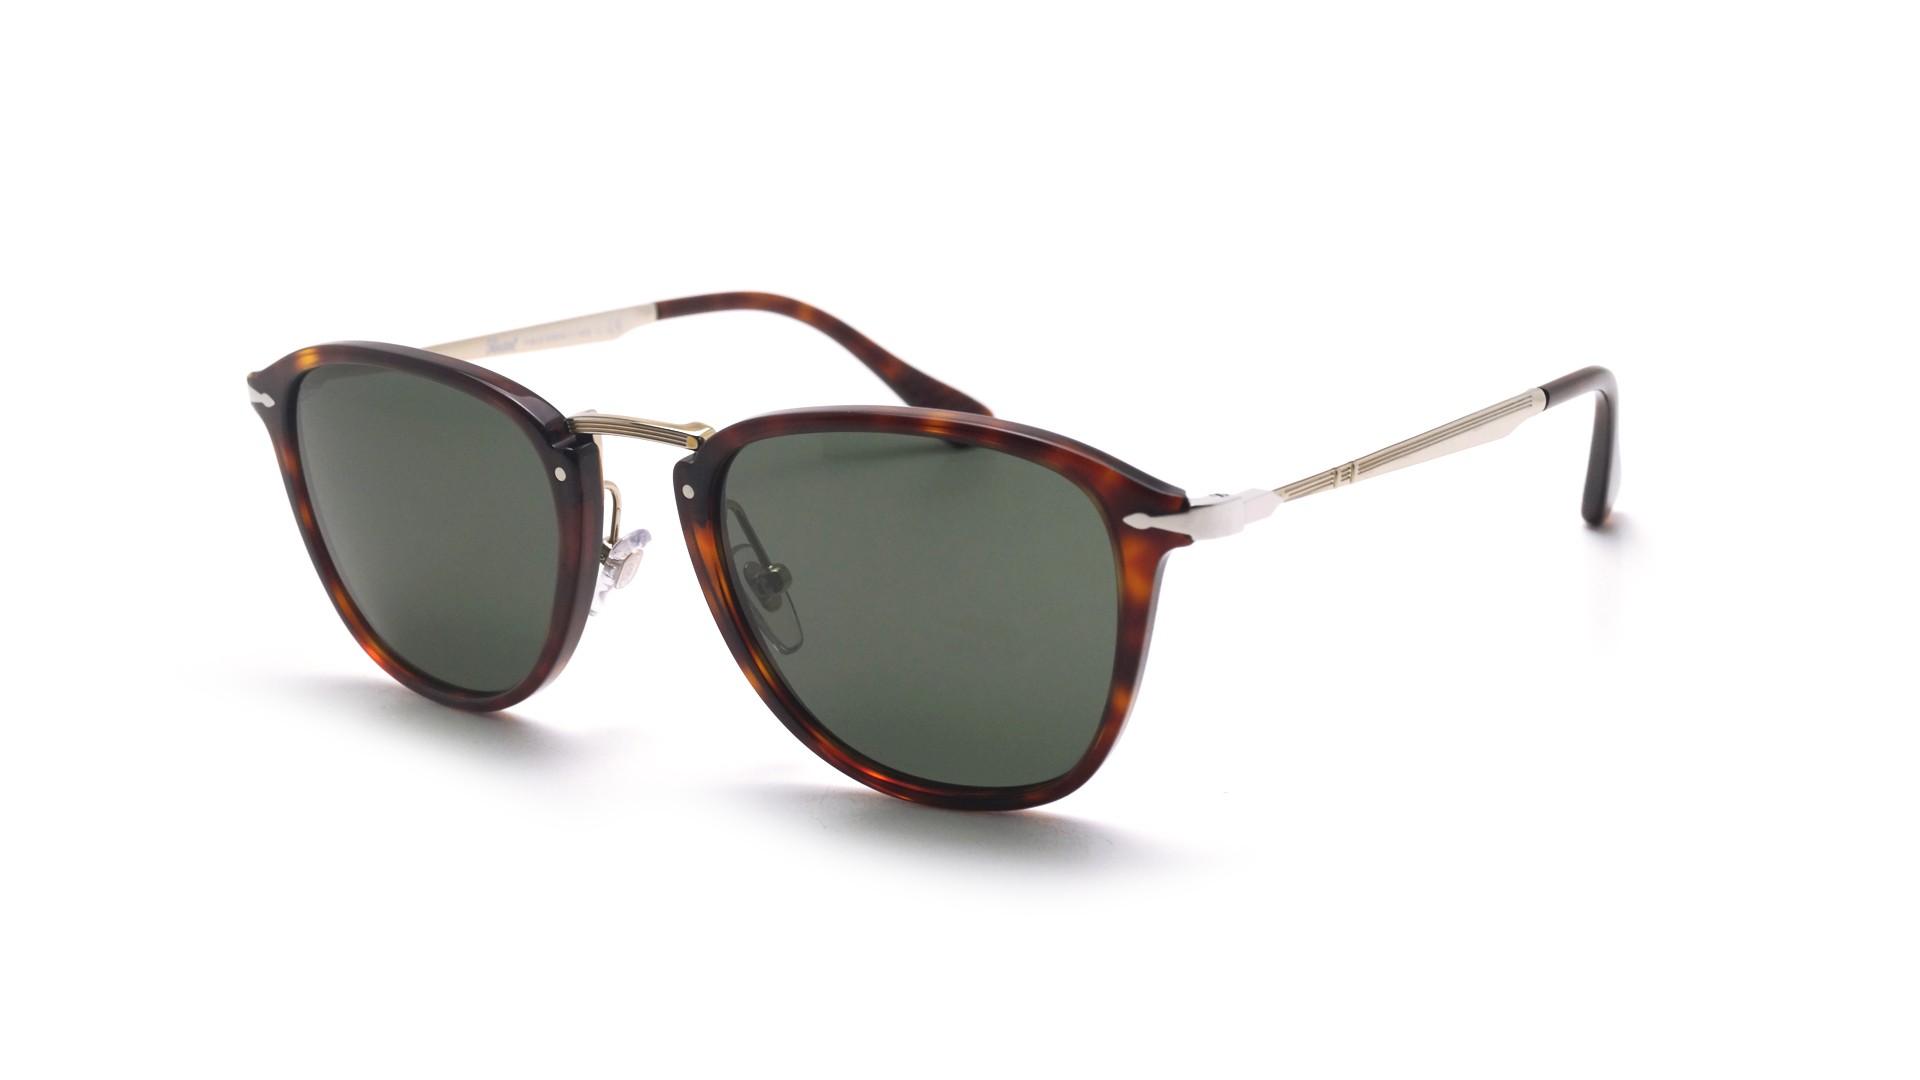 18c6cdd8bf Sunglasses Persol Calligrapher edition Havana Tortoise PO3165S 24 31 52-22  Large